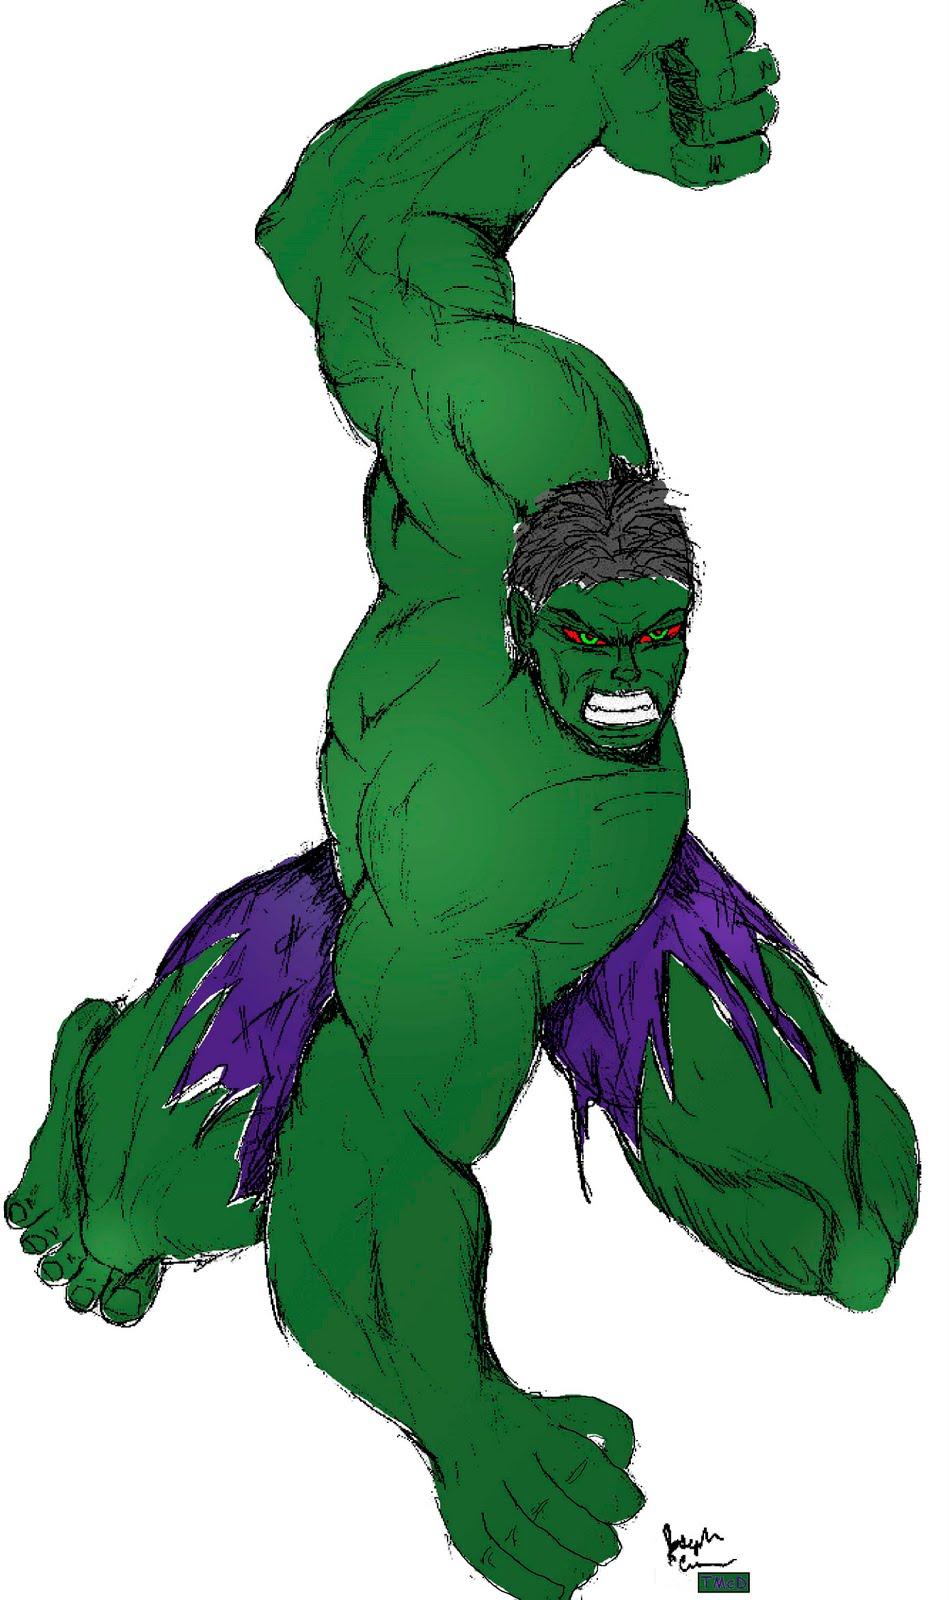 Top Mouse Art work: Hulk Smash in Color